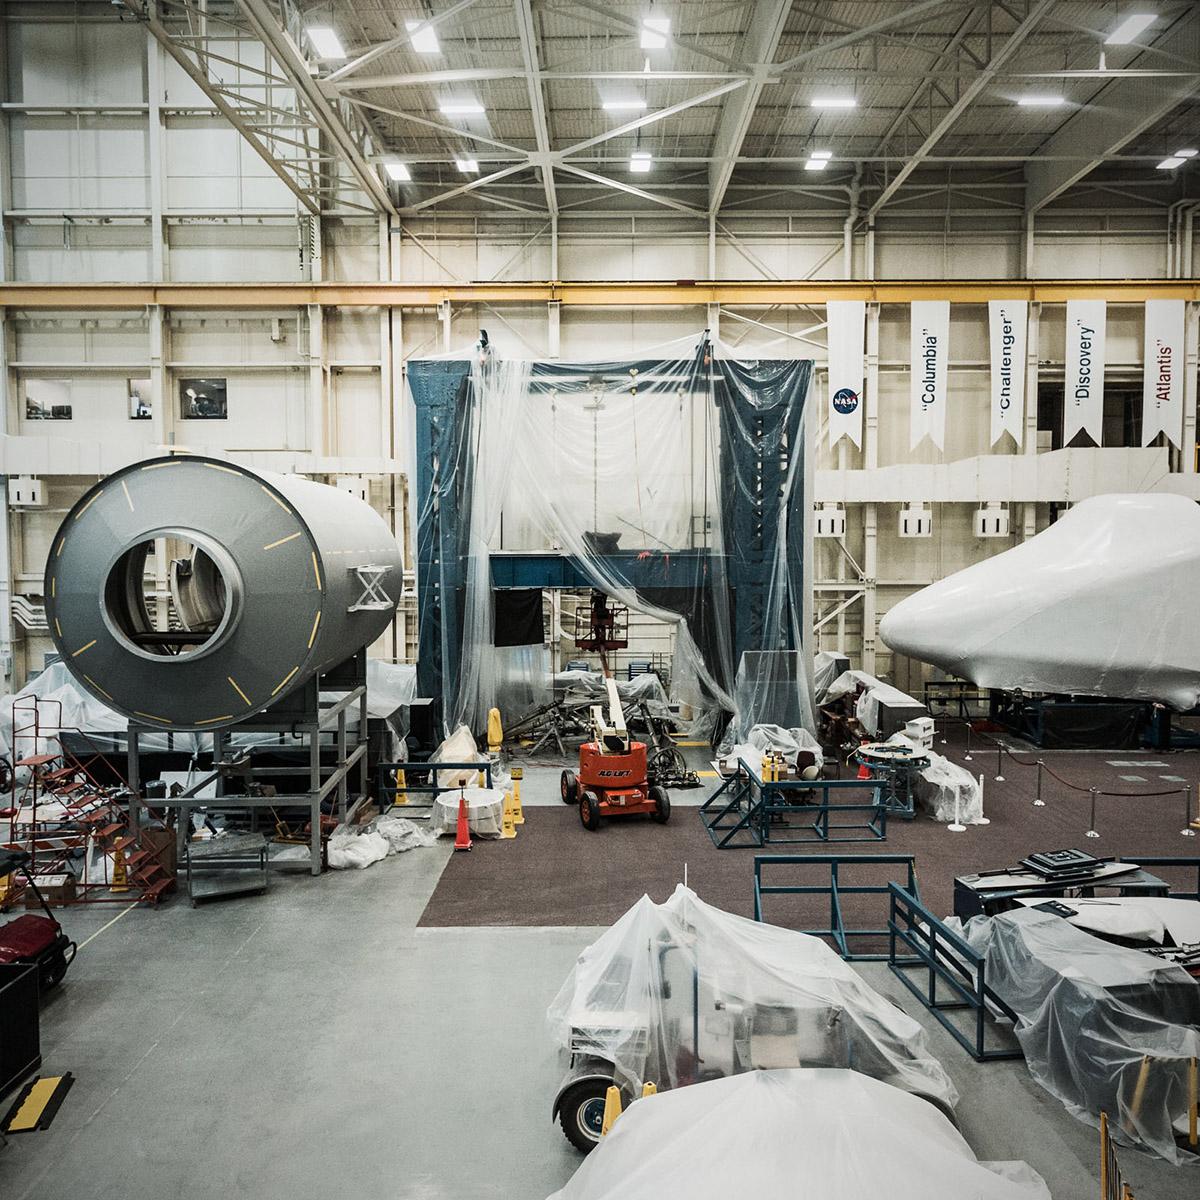 Houston Space Center factory floor